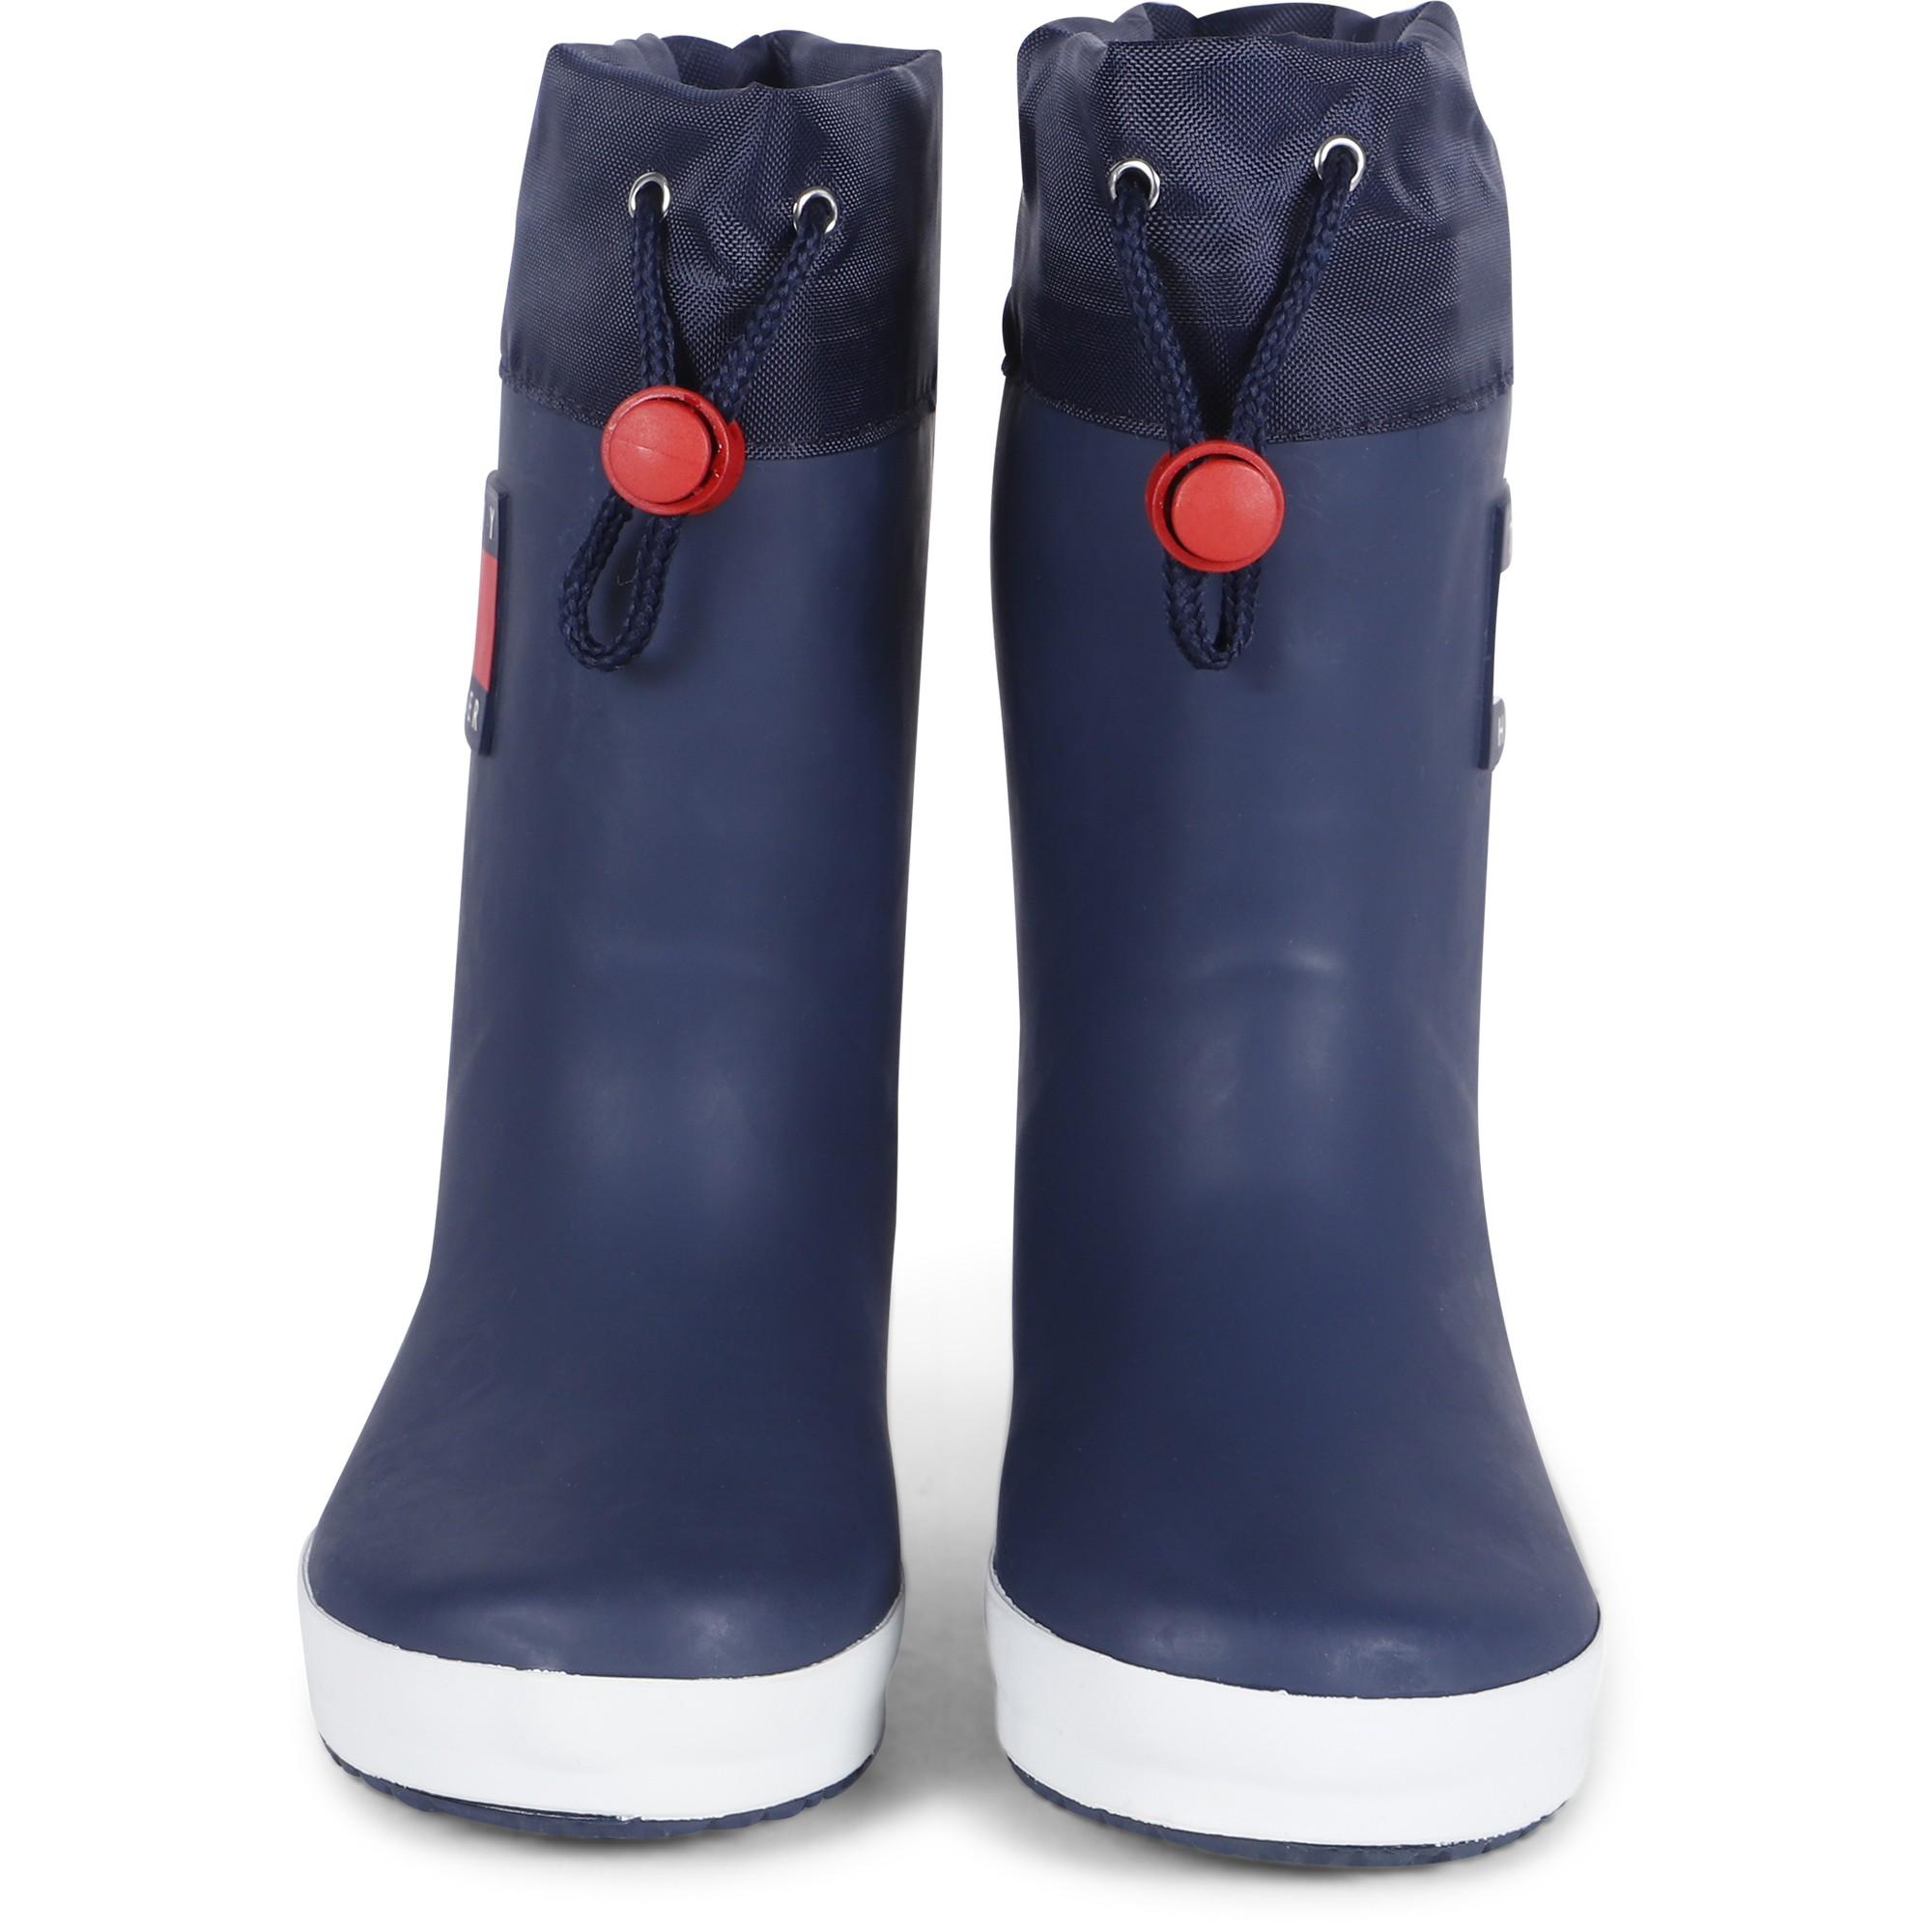 Tommy Hilfiger Logo Rain Boots In Blue - Bambinifashioncom-4887